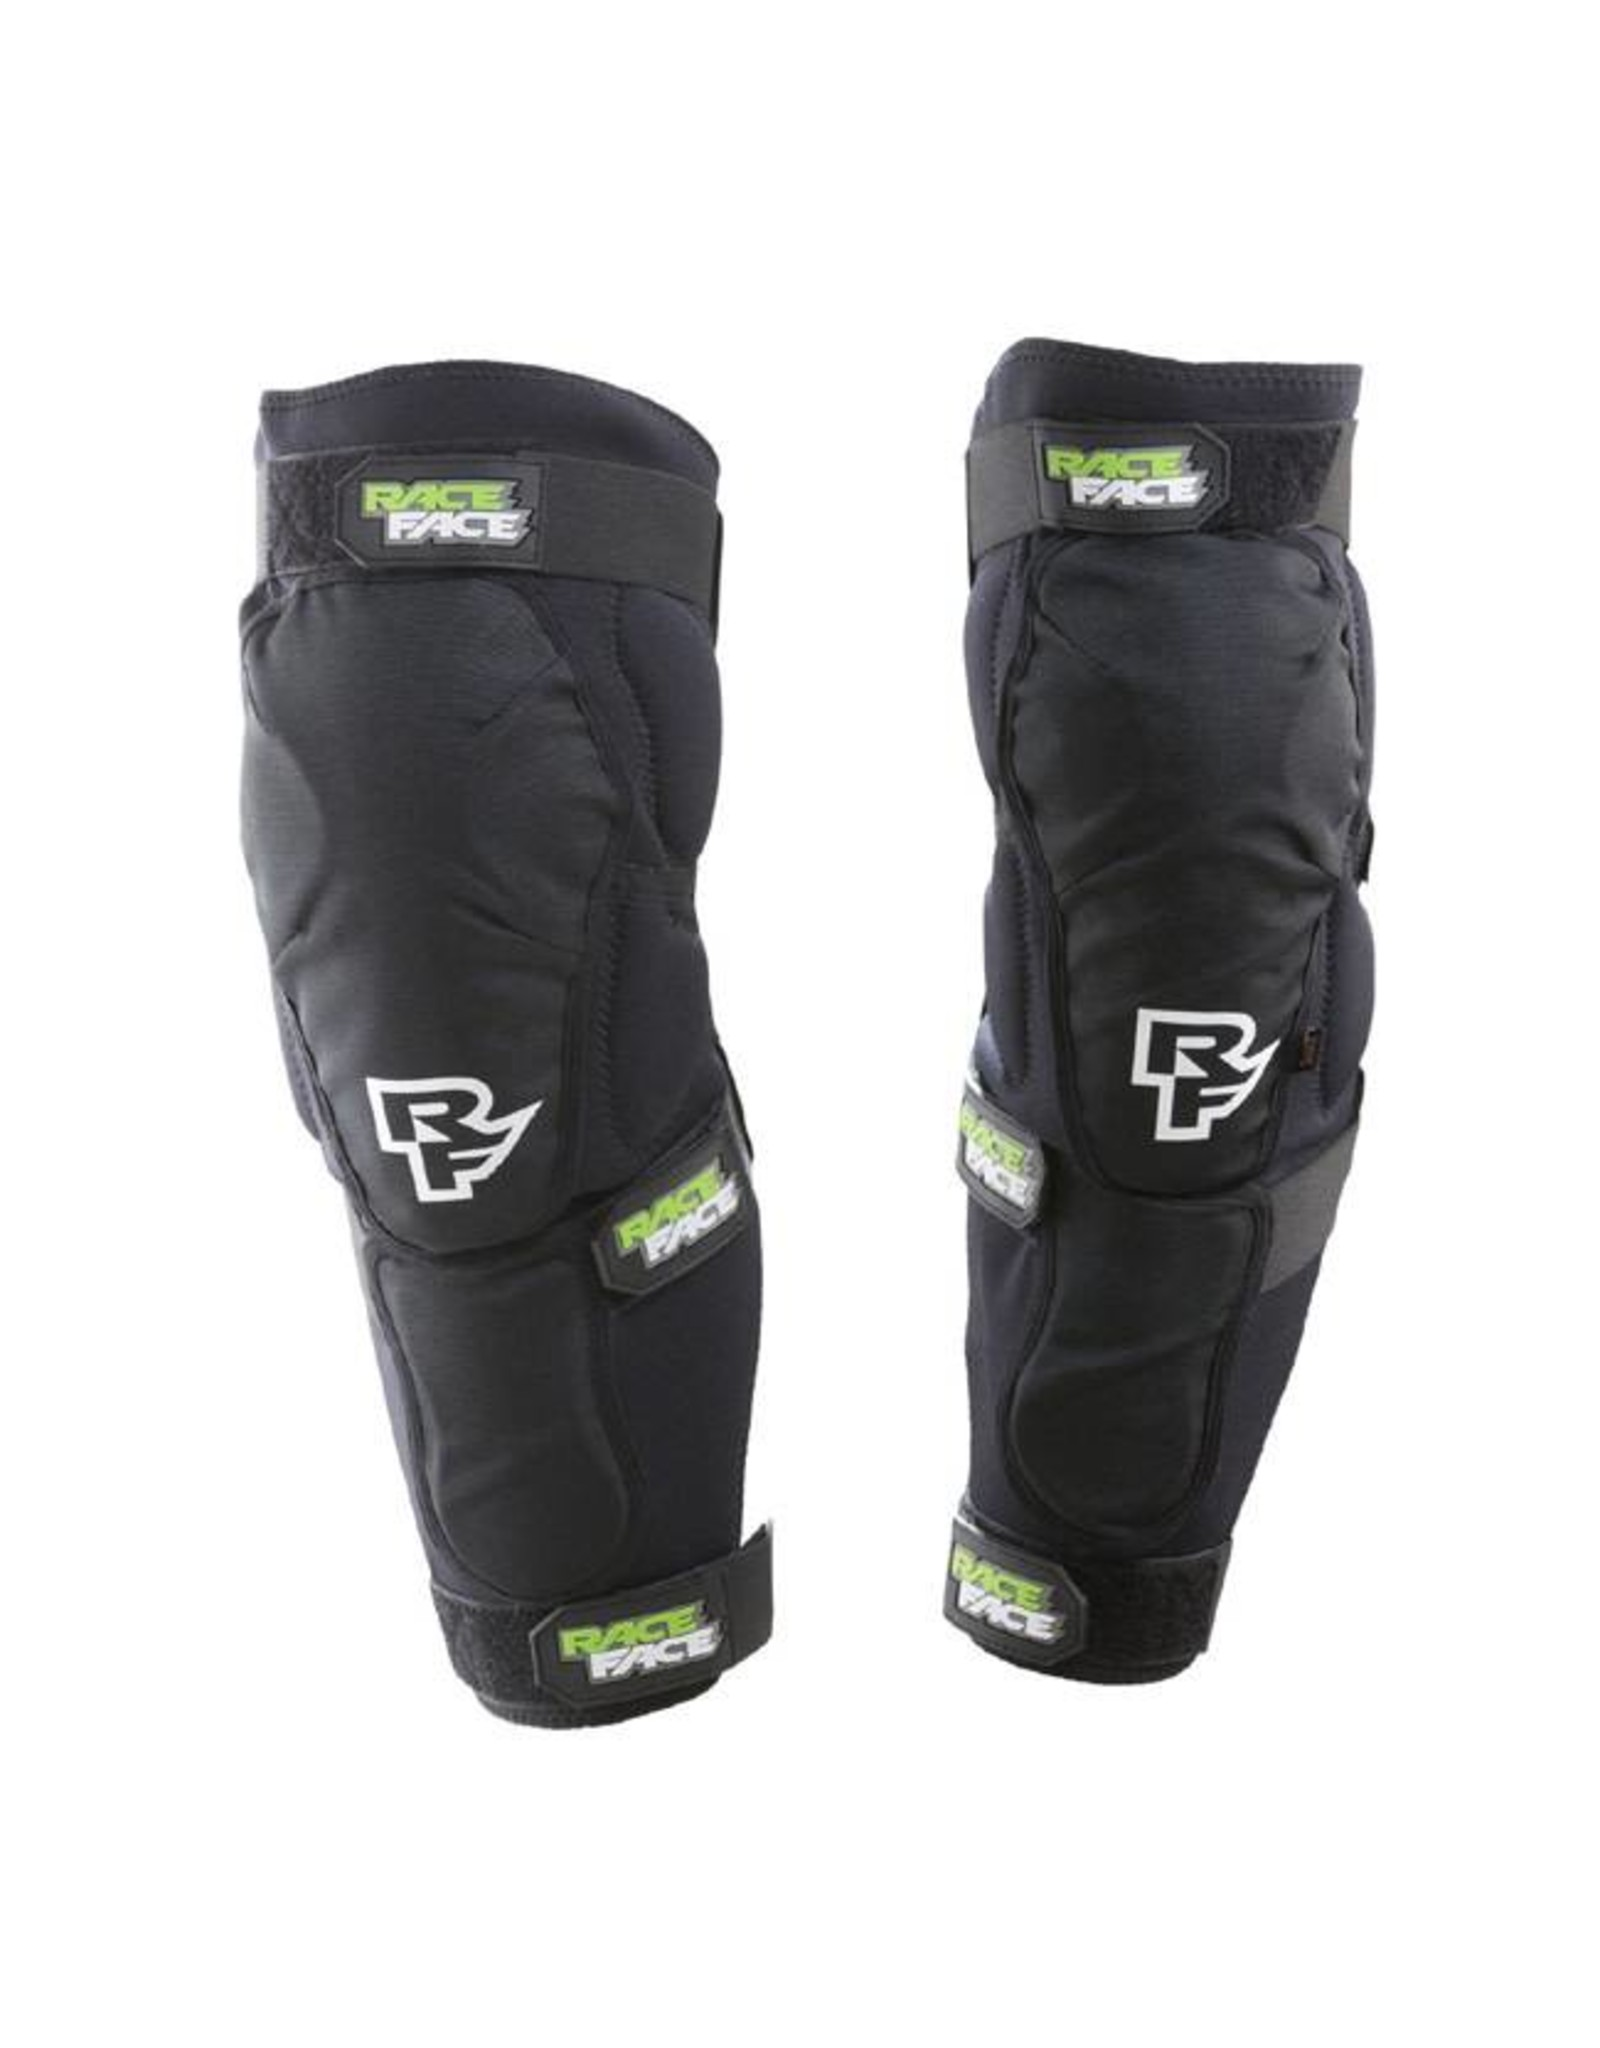 RaceFace RaceFace Flank Leg Guard: Black XL